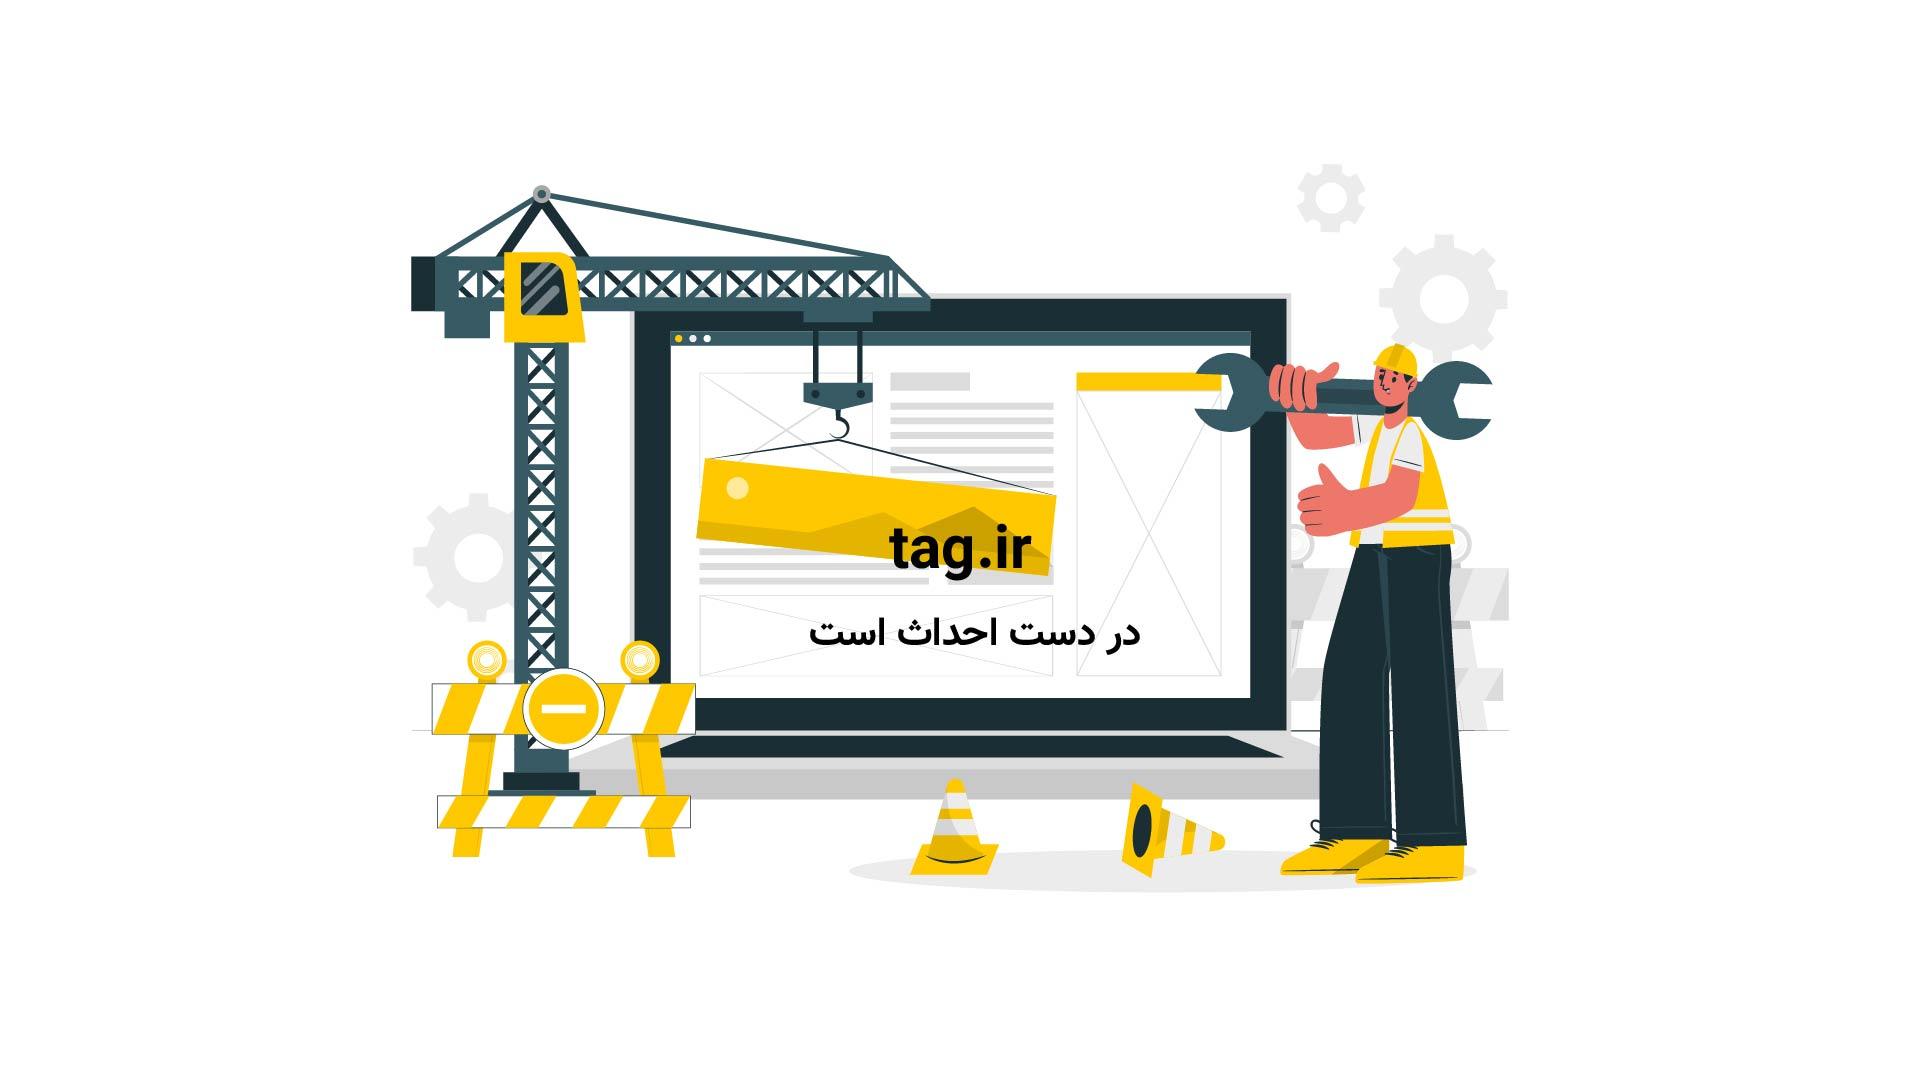 خلاصه بازی بسکتبال لس آنجلس لیکرز ۹۲ – ۱۱۶ ساکرامنتو کینگز | فیلم